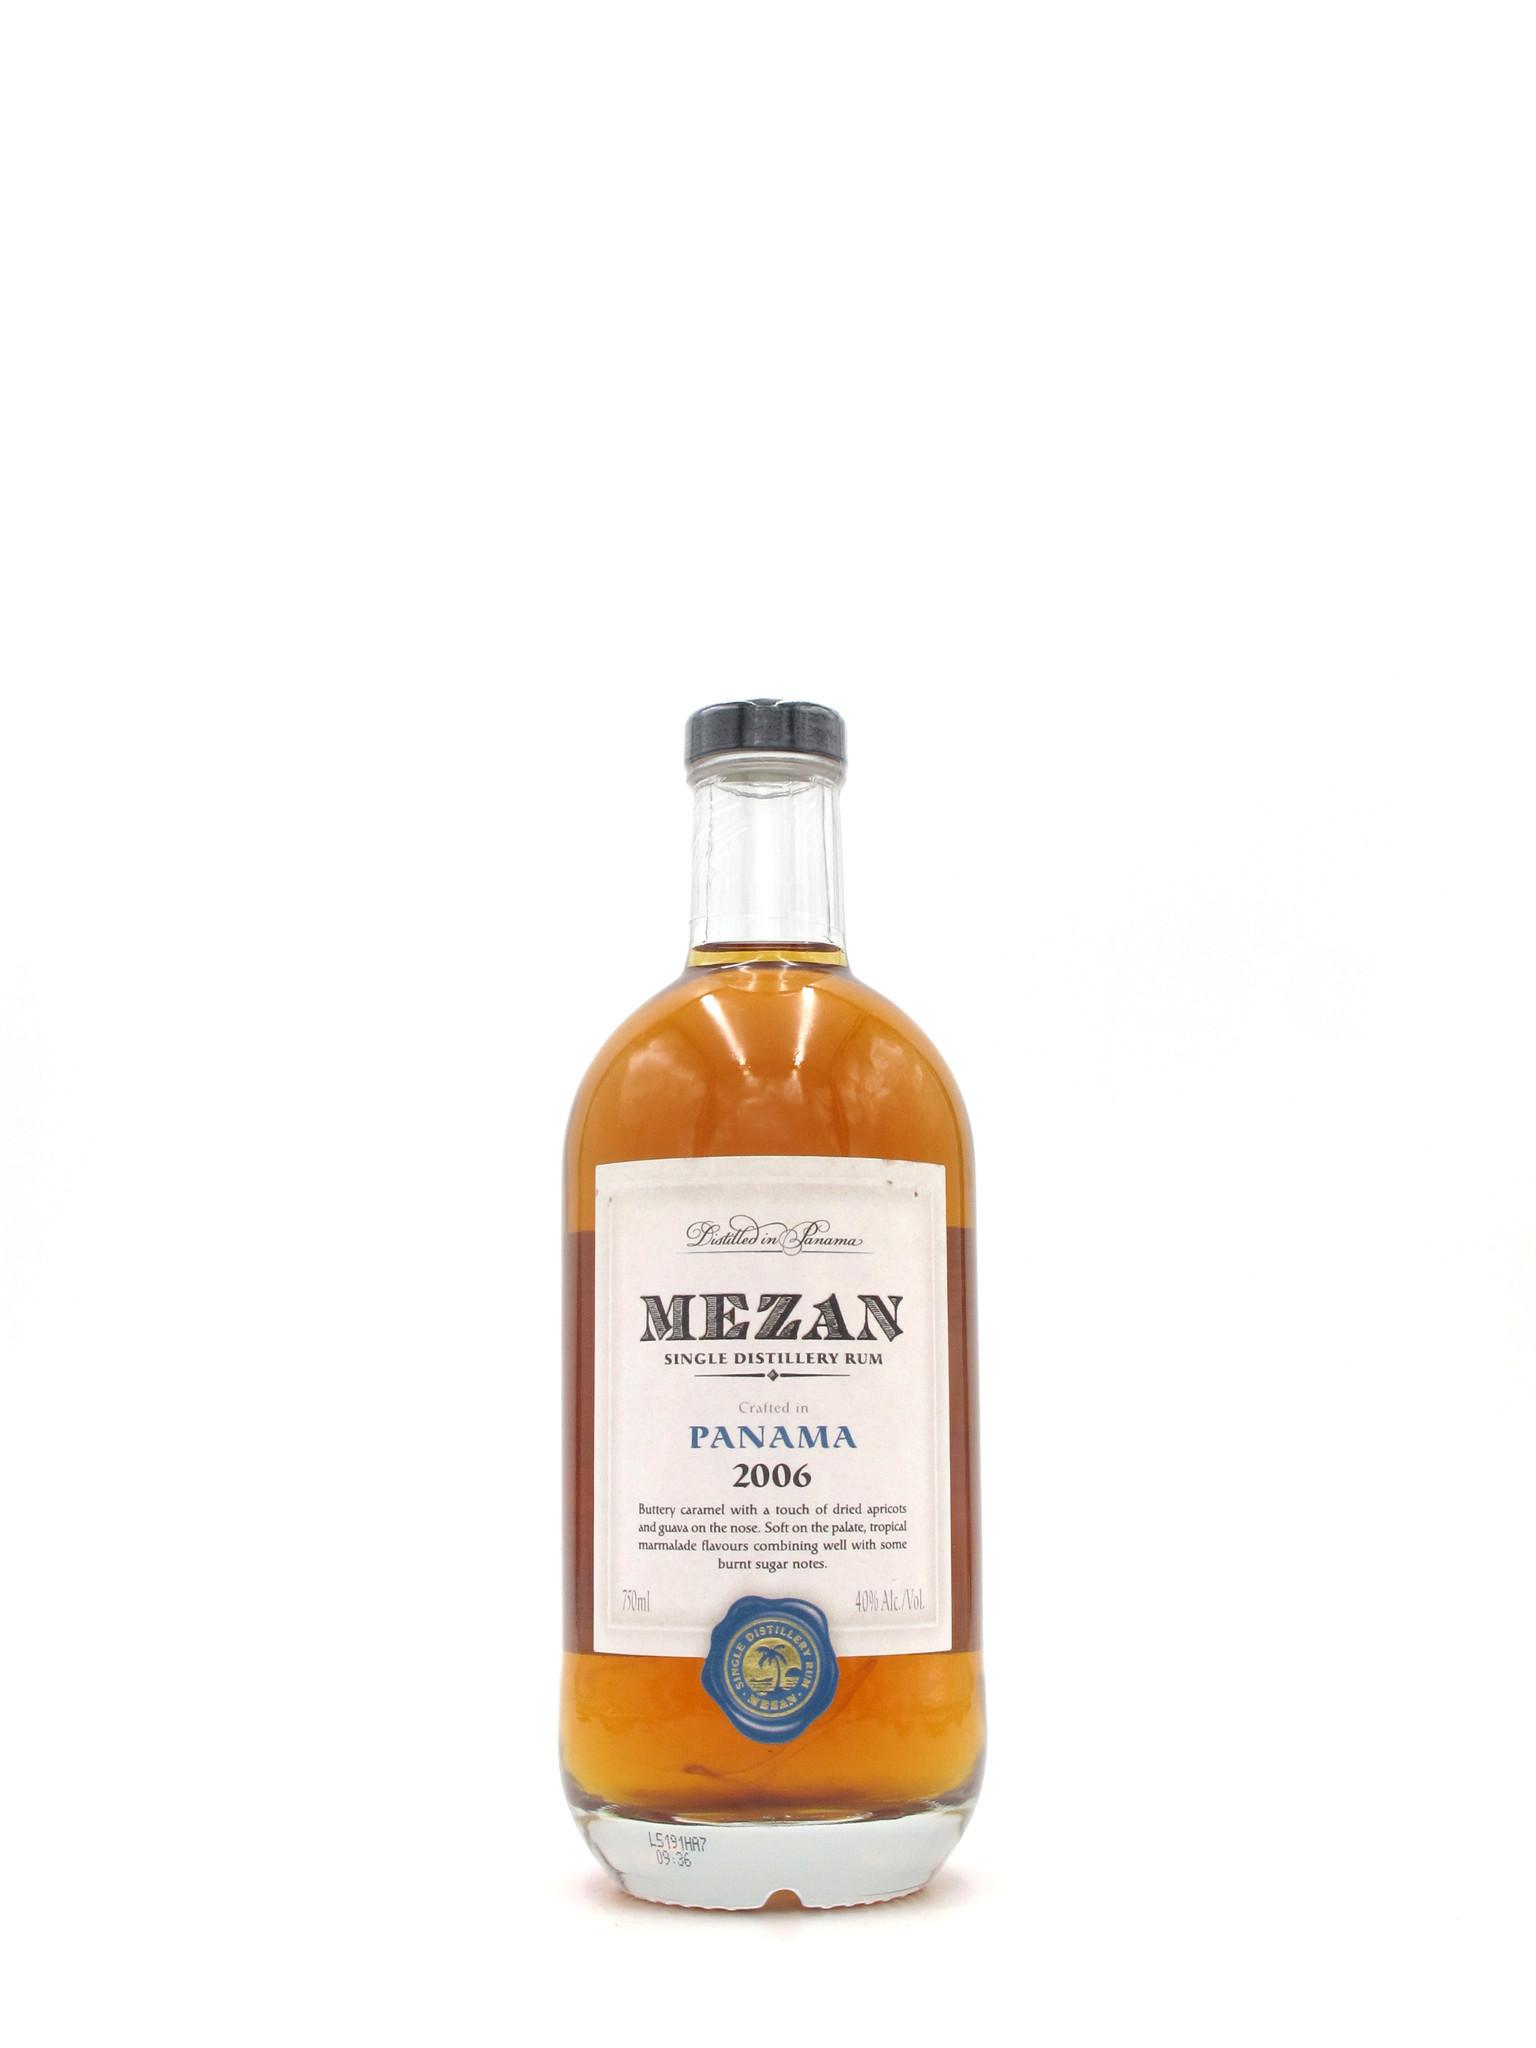 Mezan 2006 Mezan Panama Rum 750ML